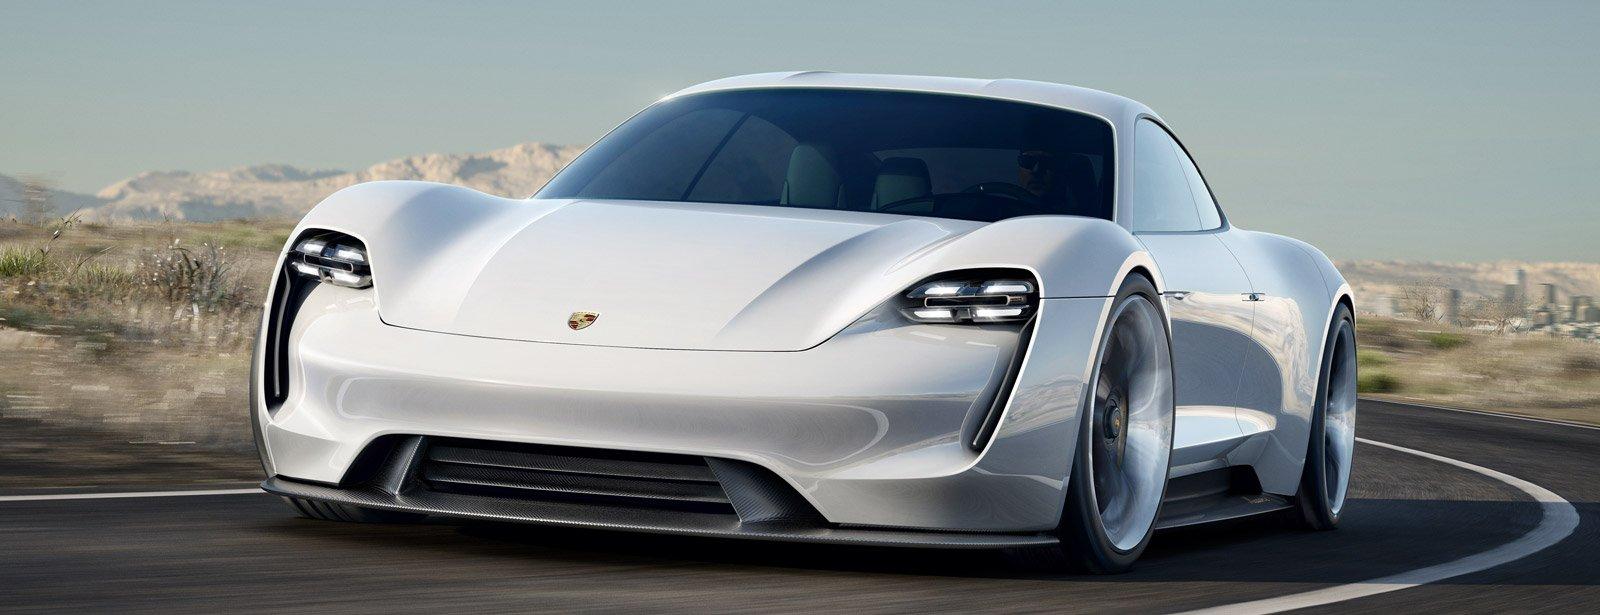 Porsche-Mission-E-TheLuxuryTrends